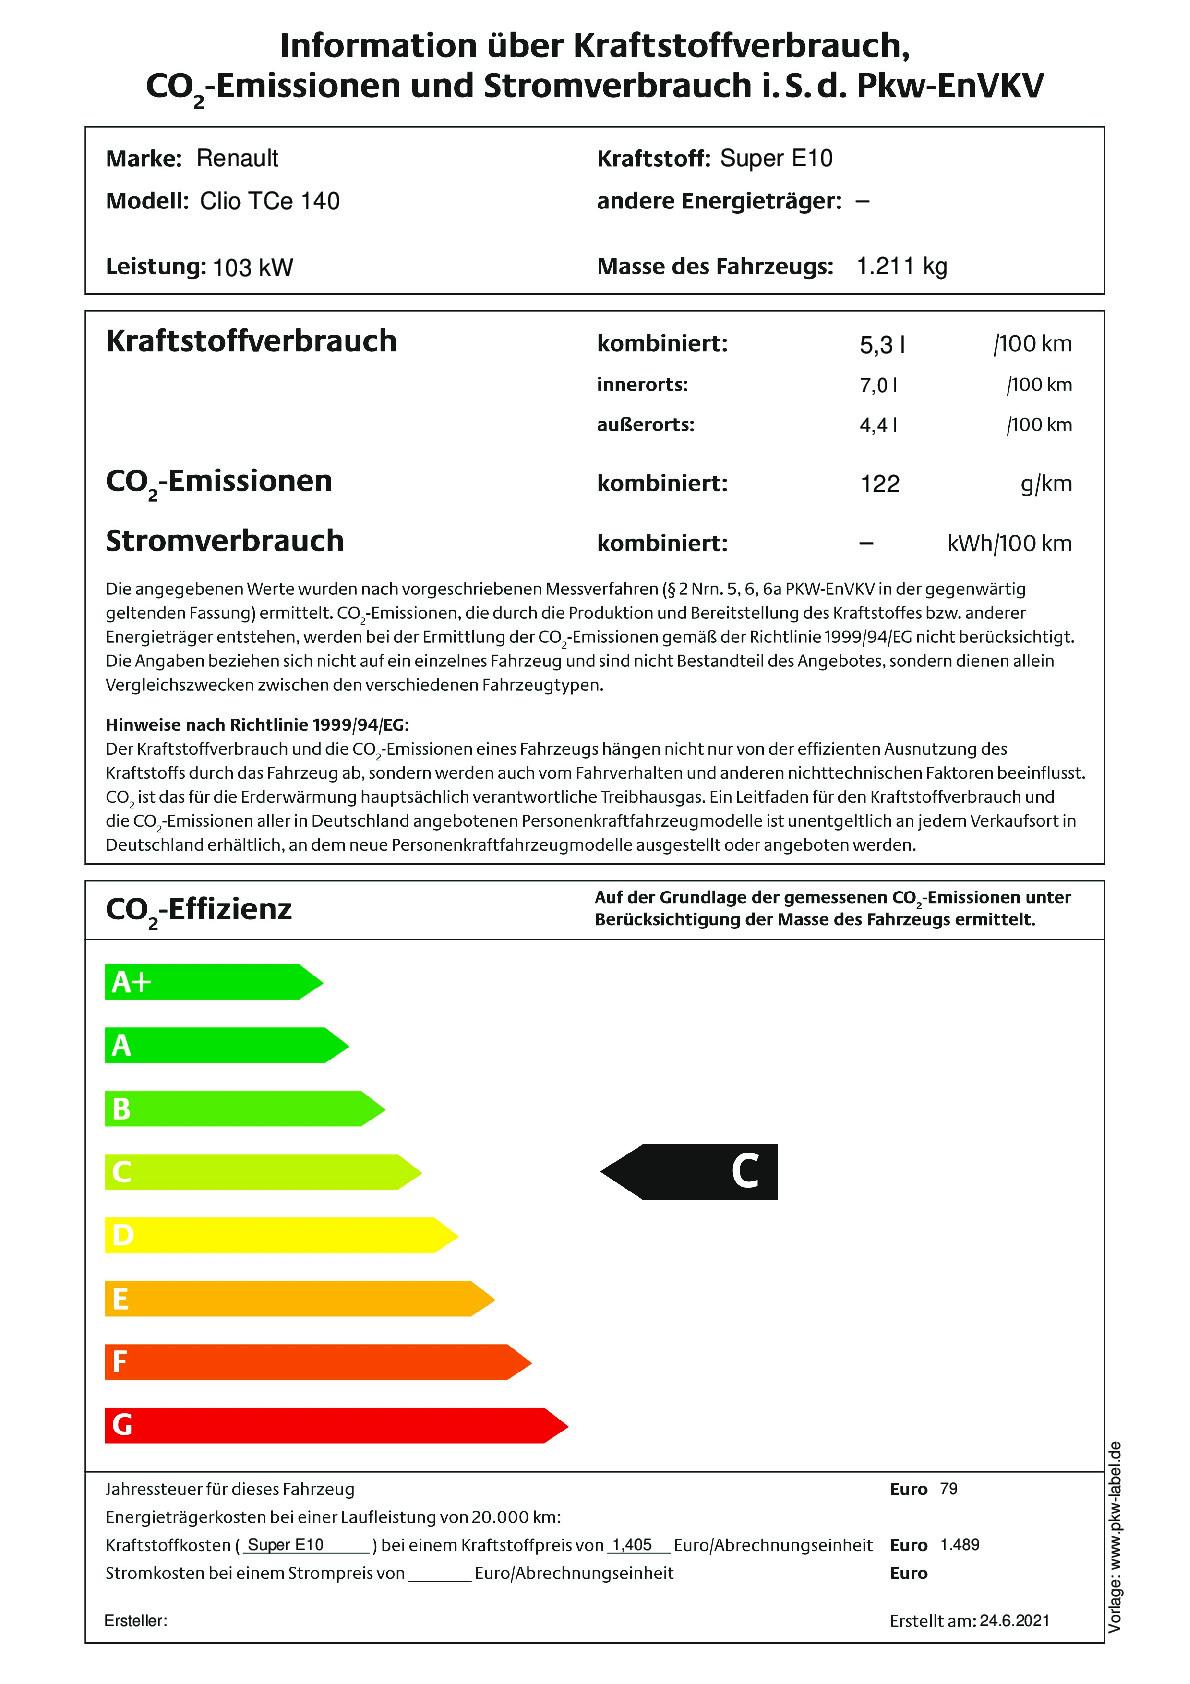 Energielabel TCe 140